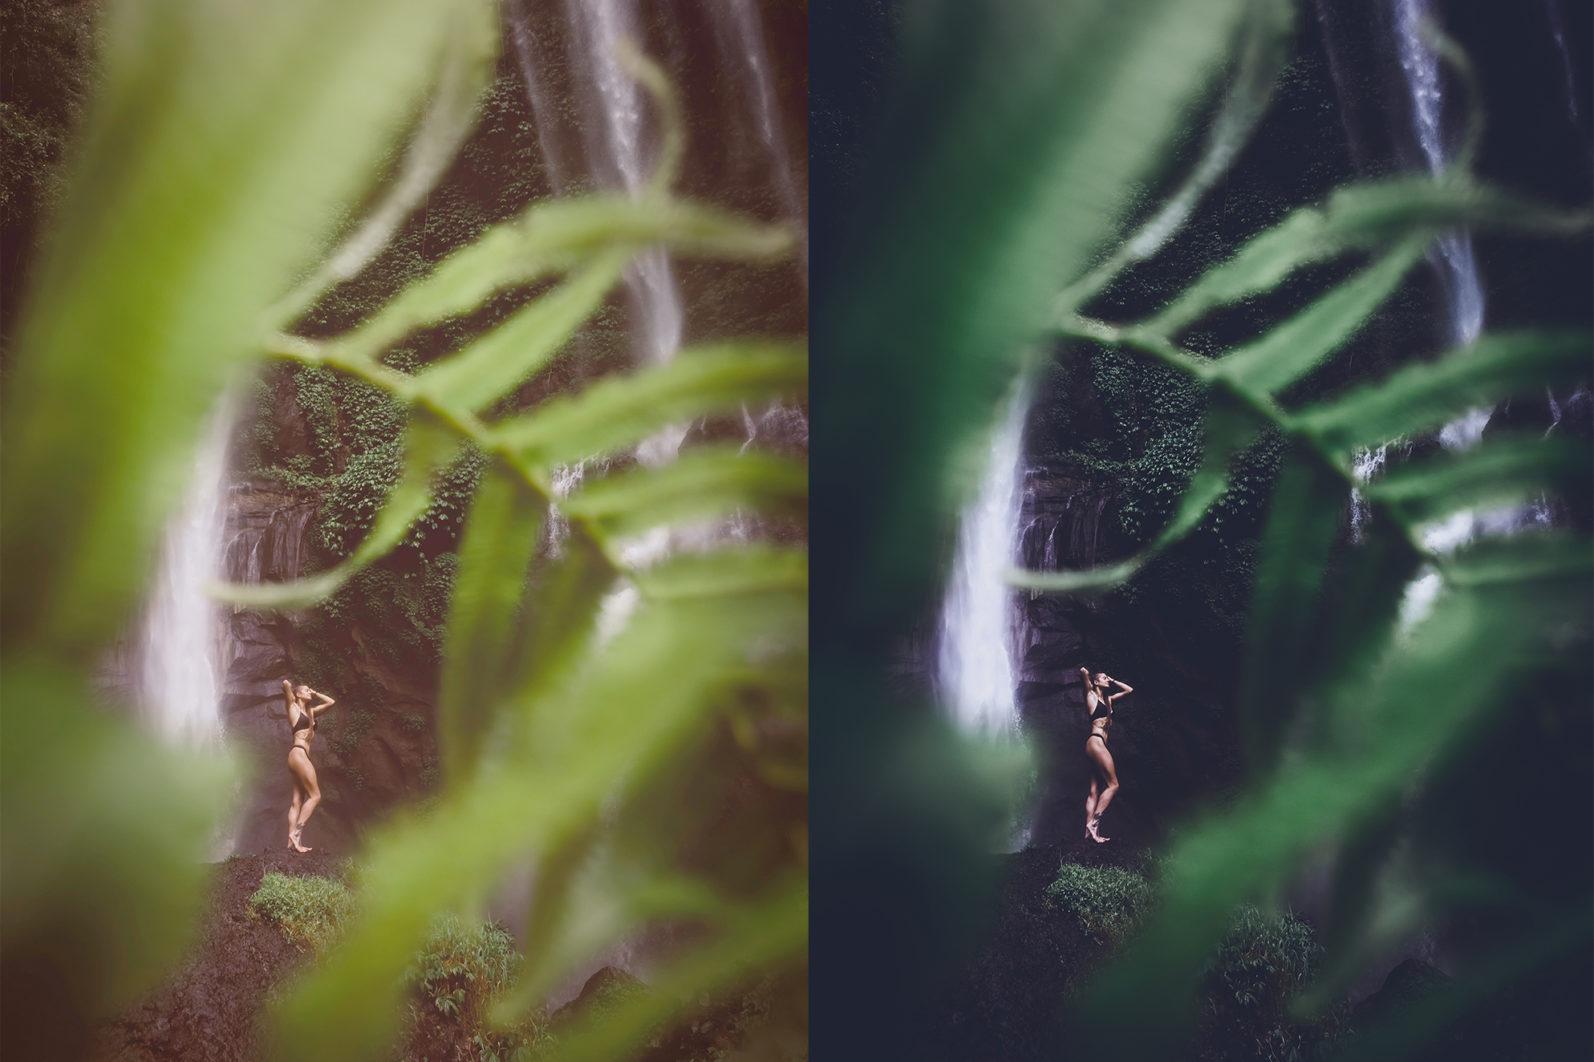 10 x Rain Forest Lightroom Presets | Green Lightroom Presets | Nature Presets - Rain Forest Preview 9 -